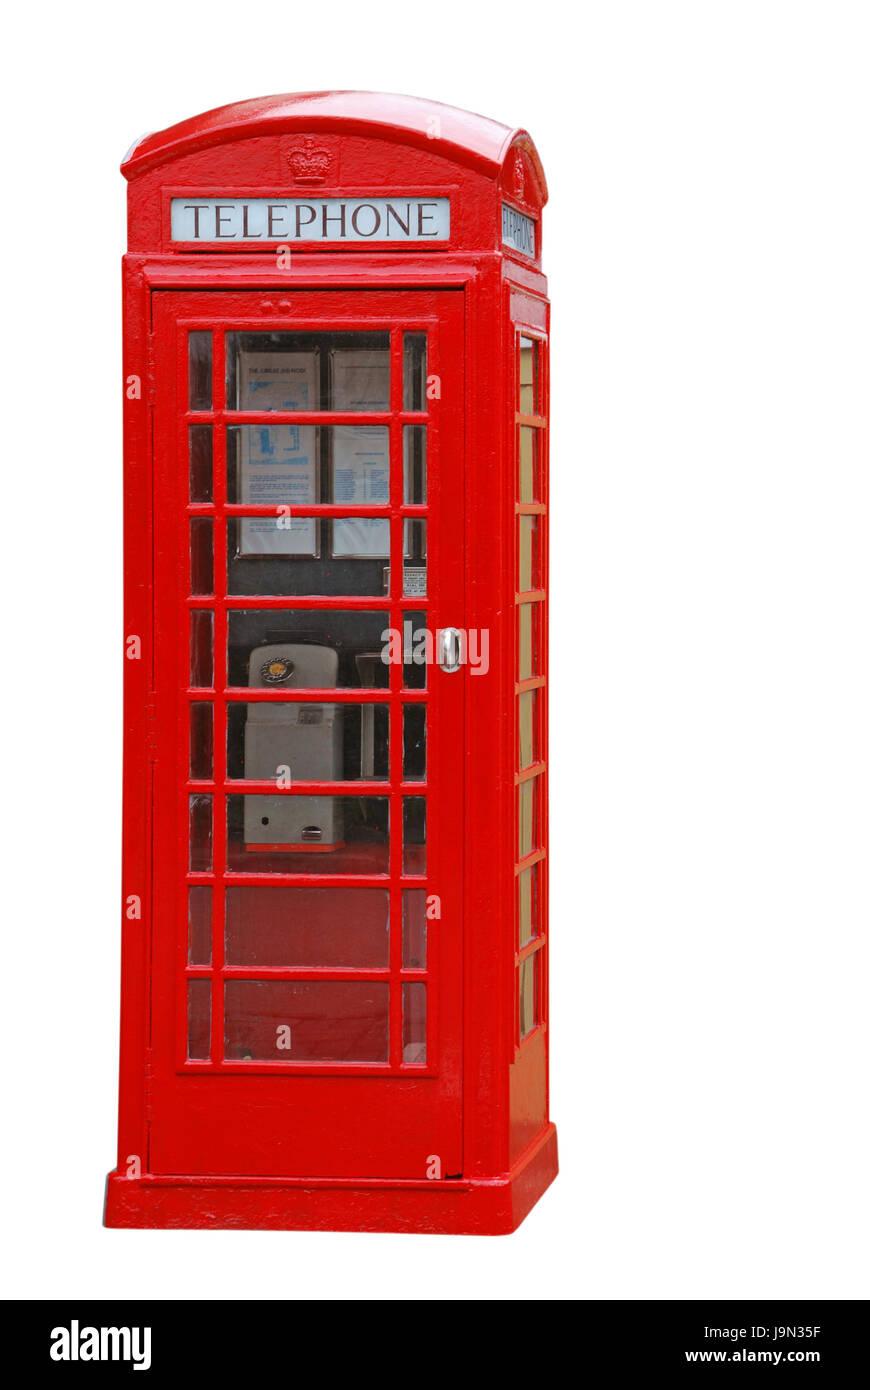 telephone, phone, isolated, booth, british, backdrop, background, white, red, - Stock Image